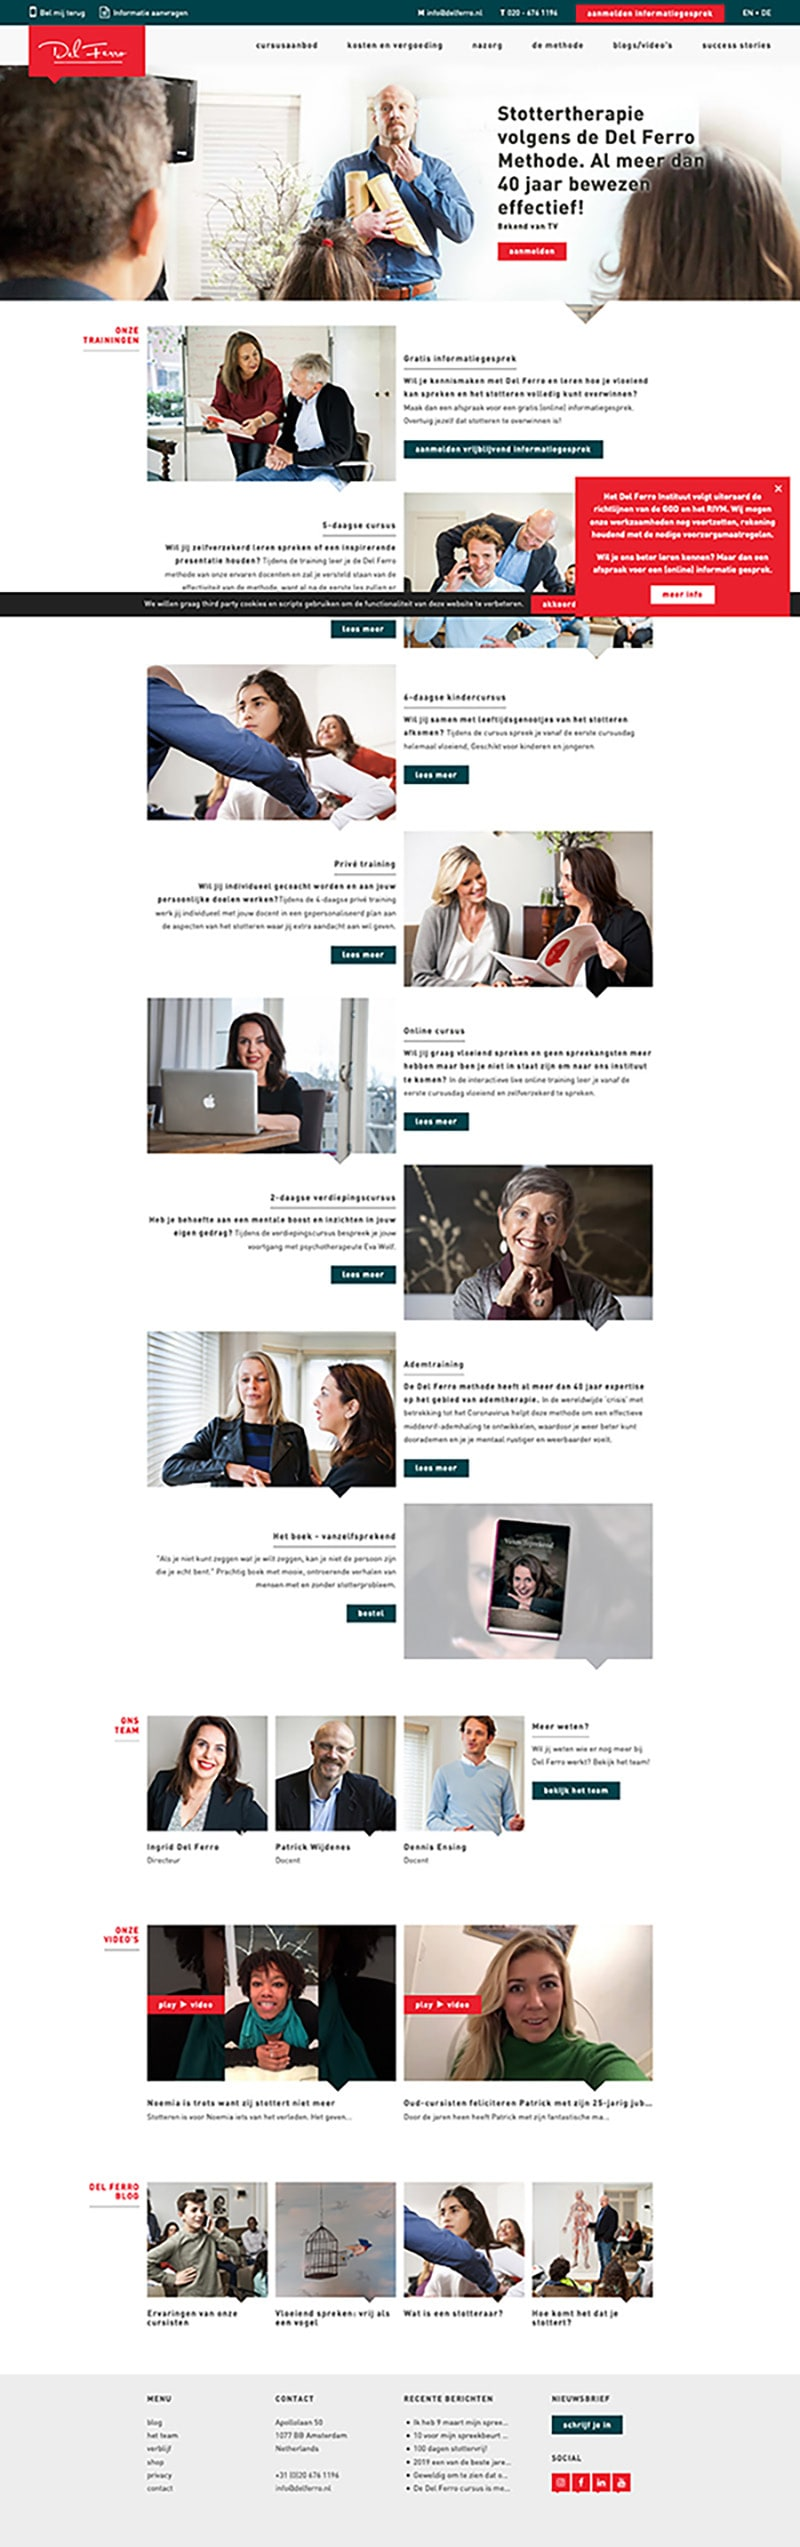 A screenshot of the delferro.nl website.